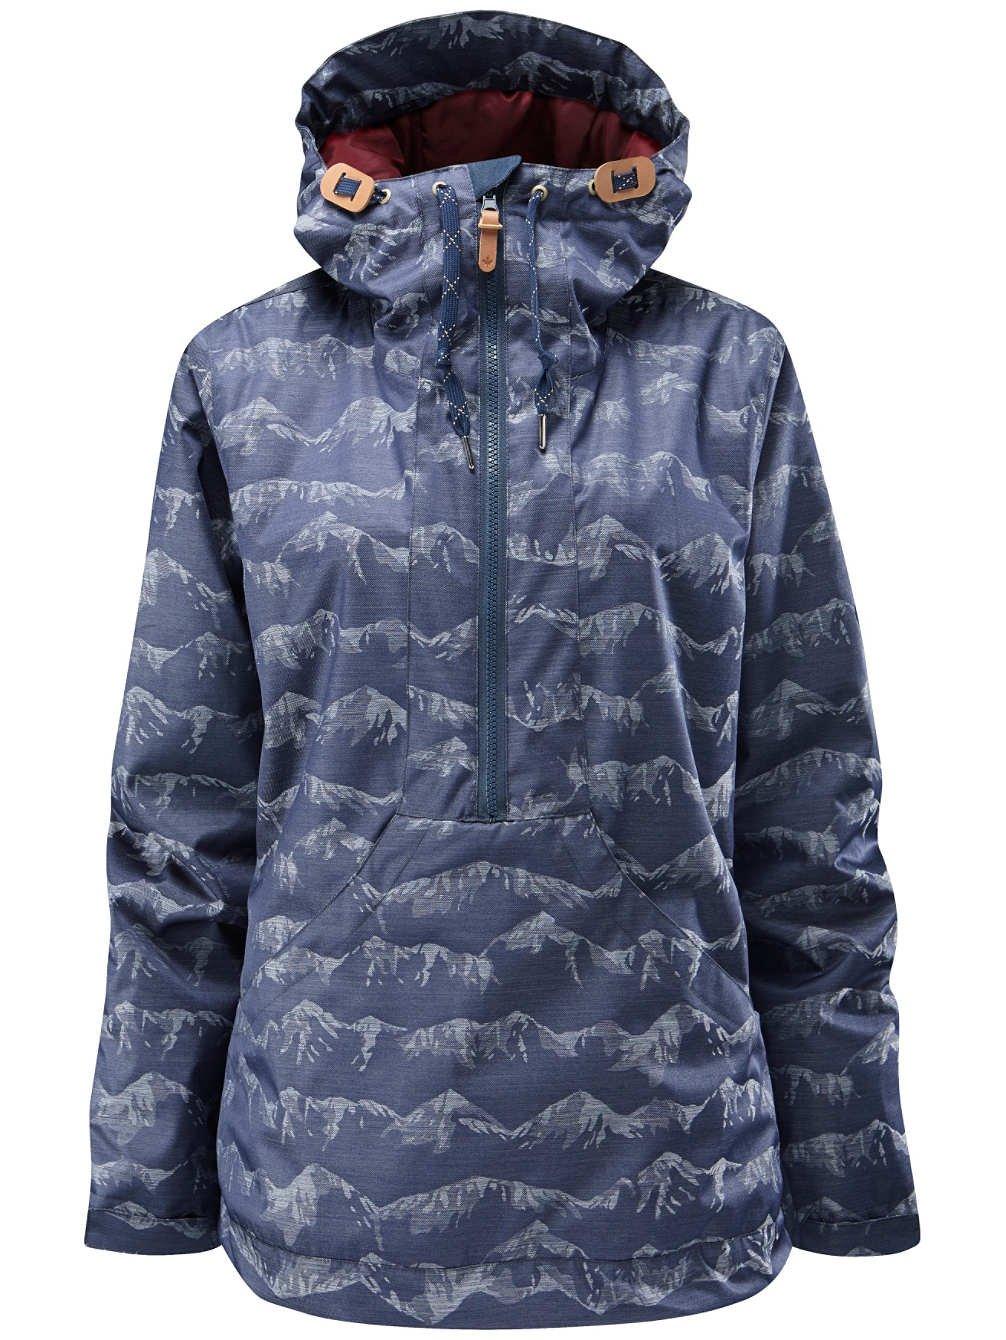 Damen Snowboard Jacke Westbeach Hottah Overhead Jacket